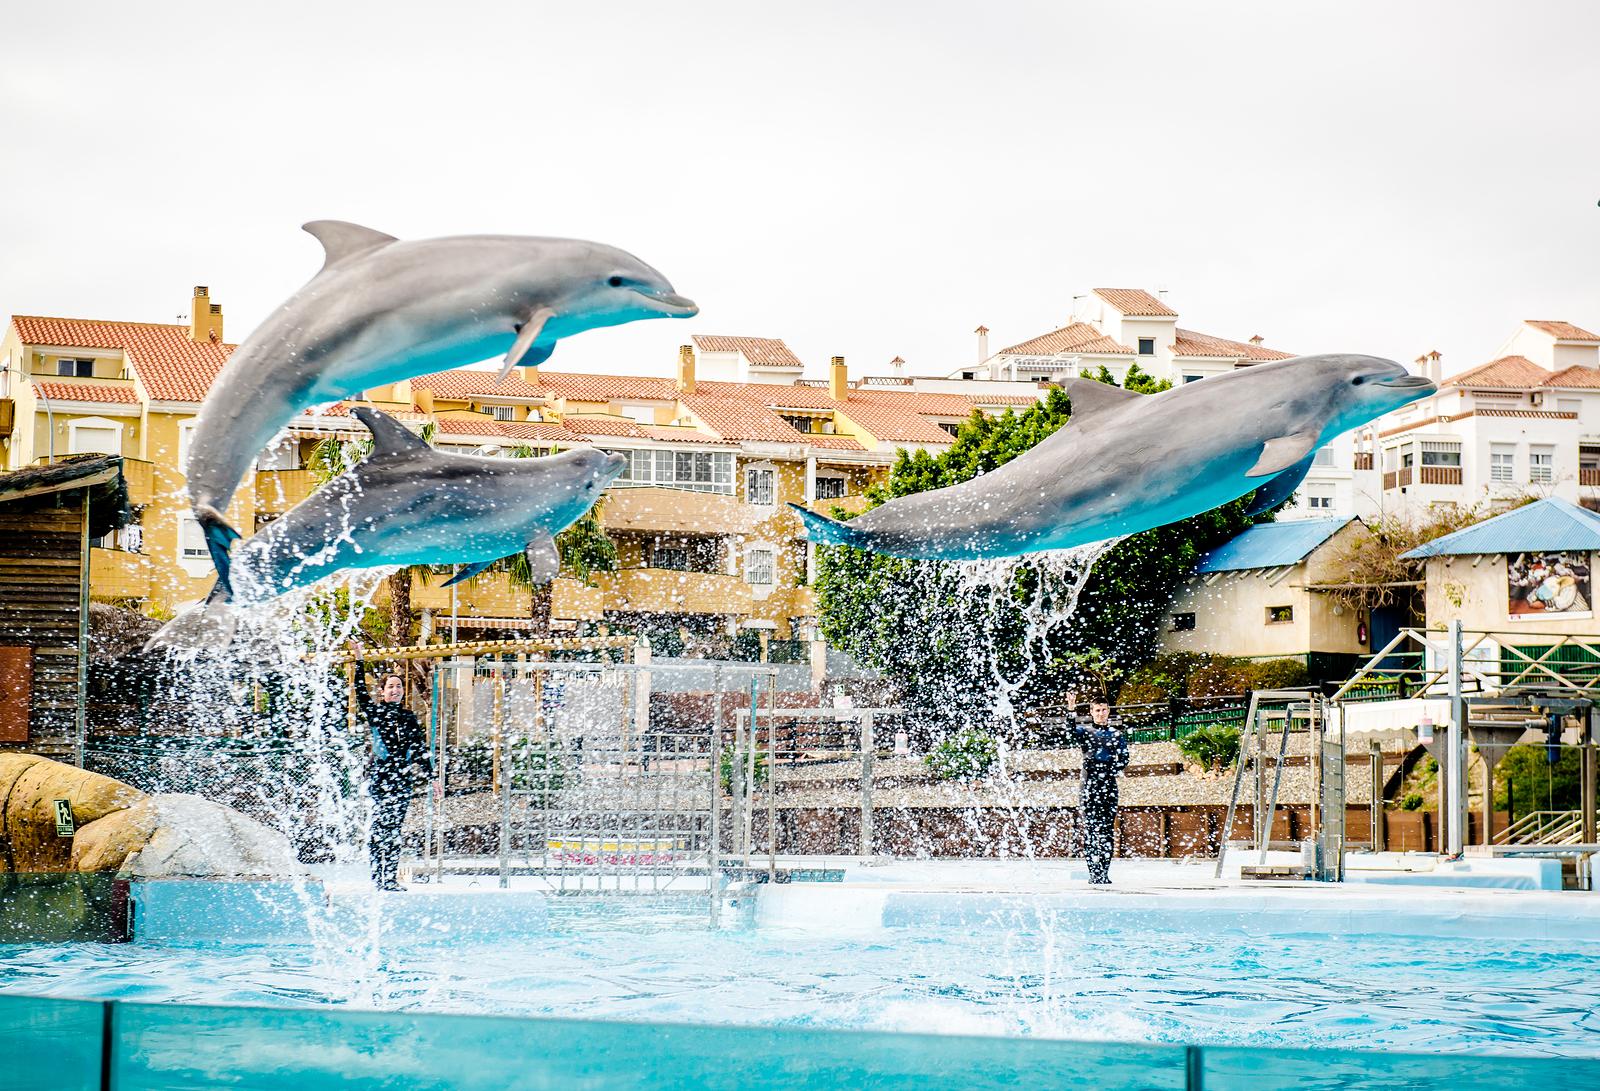 Arroyo de la Miel Dolphins show in Selwo Marina in Benalmadena, Malaga.